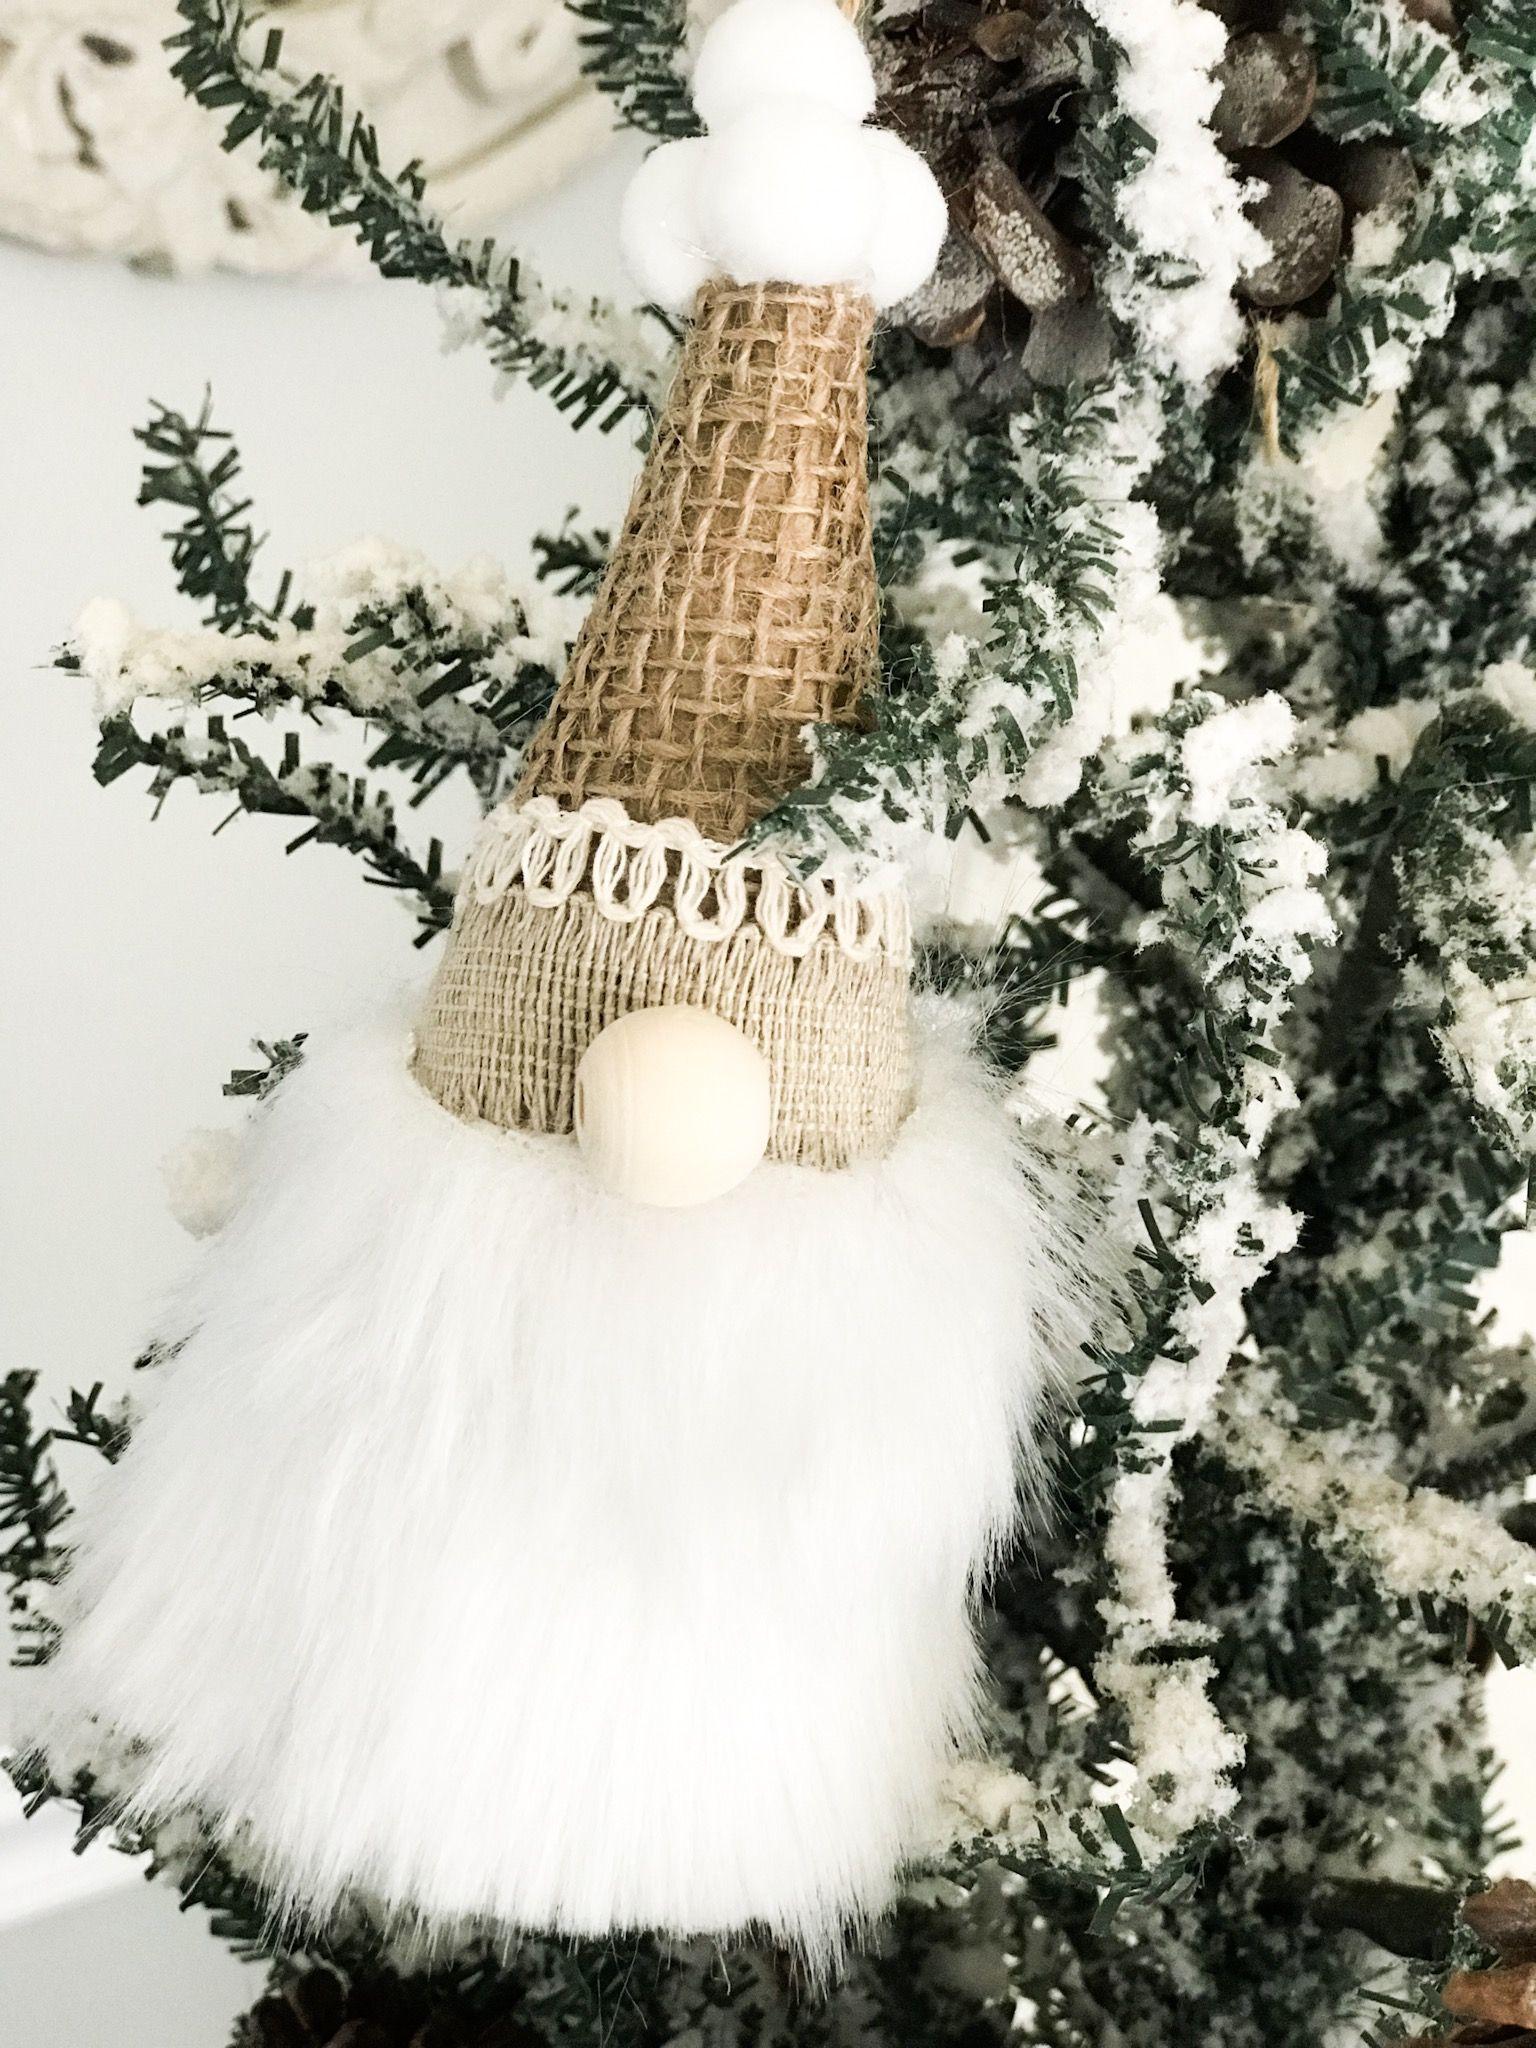 How To Make Mini Gnome Ornaments Re Fabbed Christmas Crafts Gnome Ornaments Christmas Ornaments